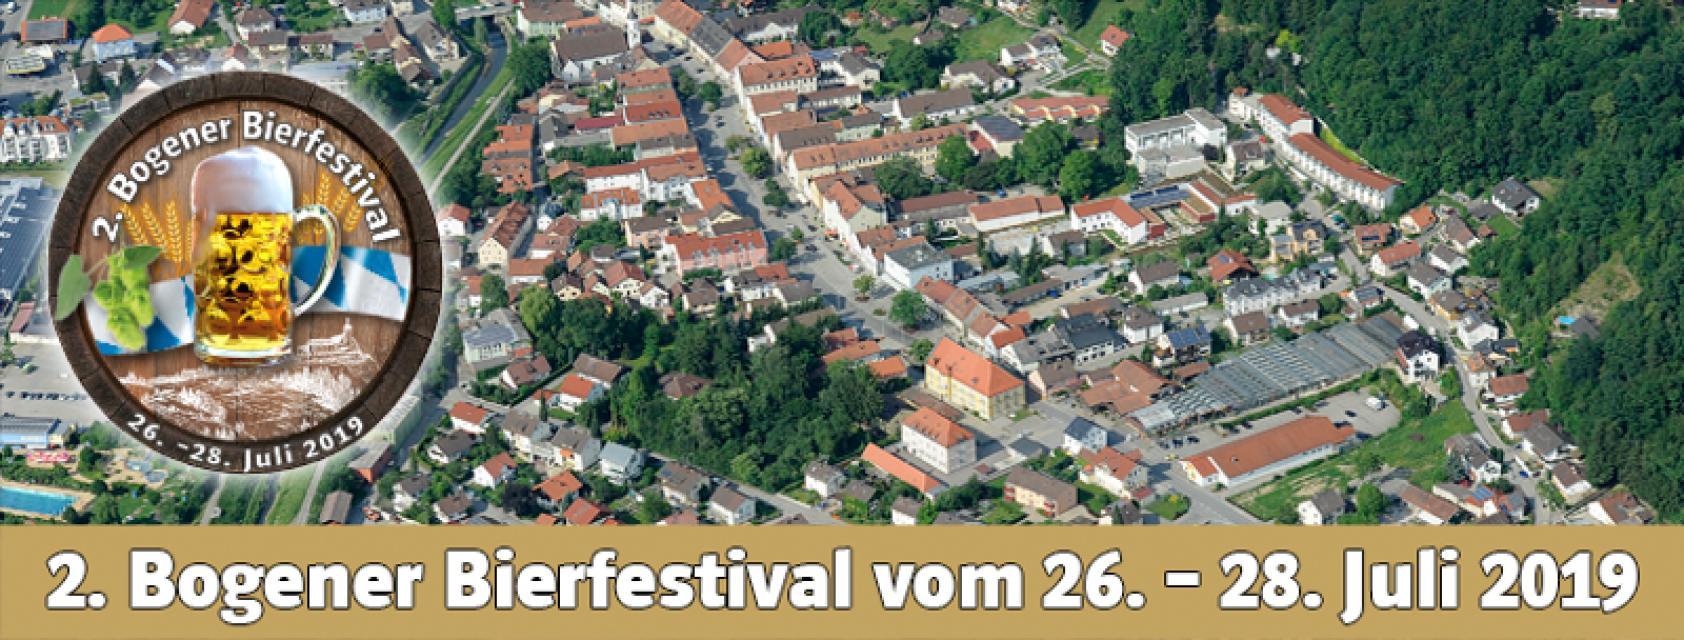 2.Bogener Bierfestival